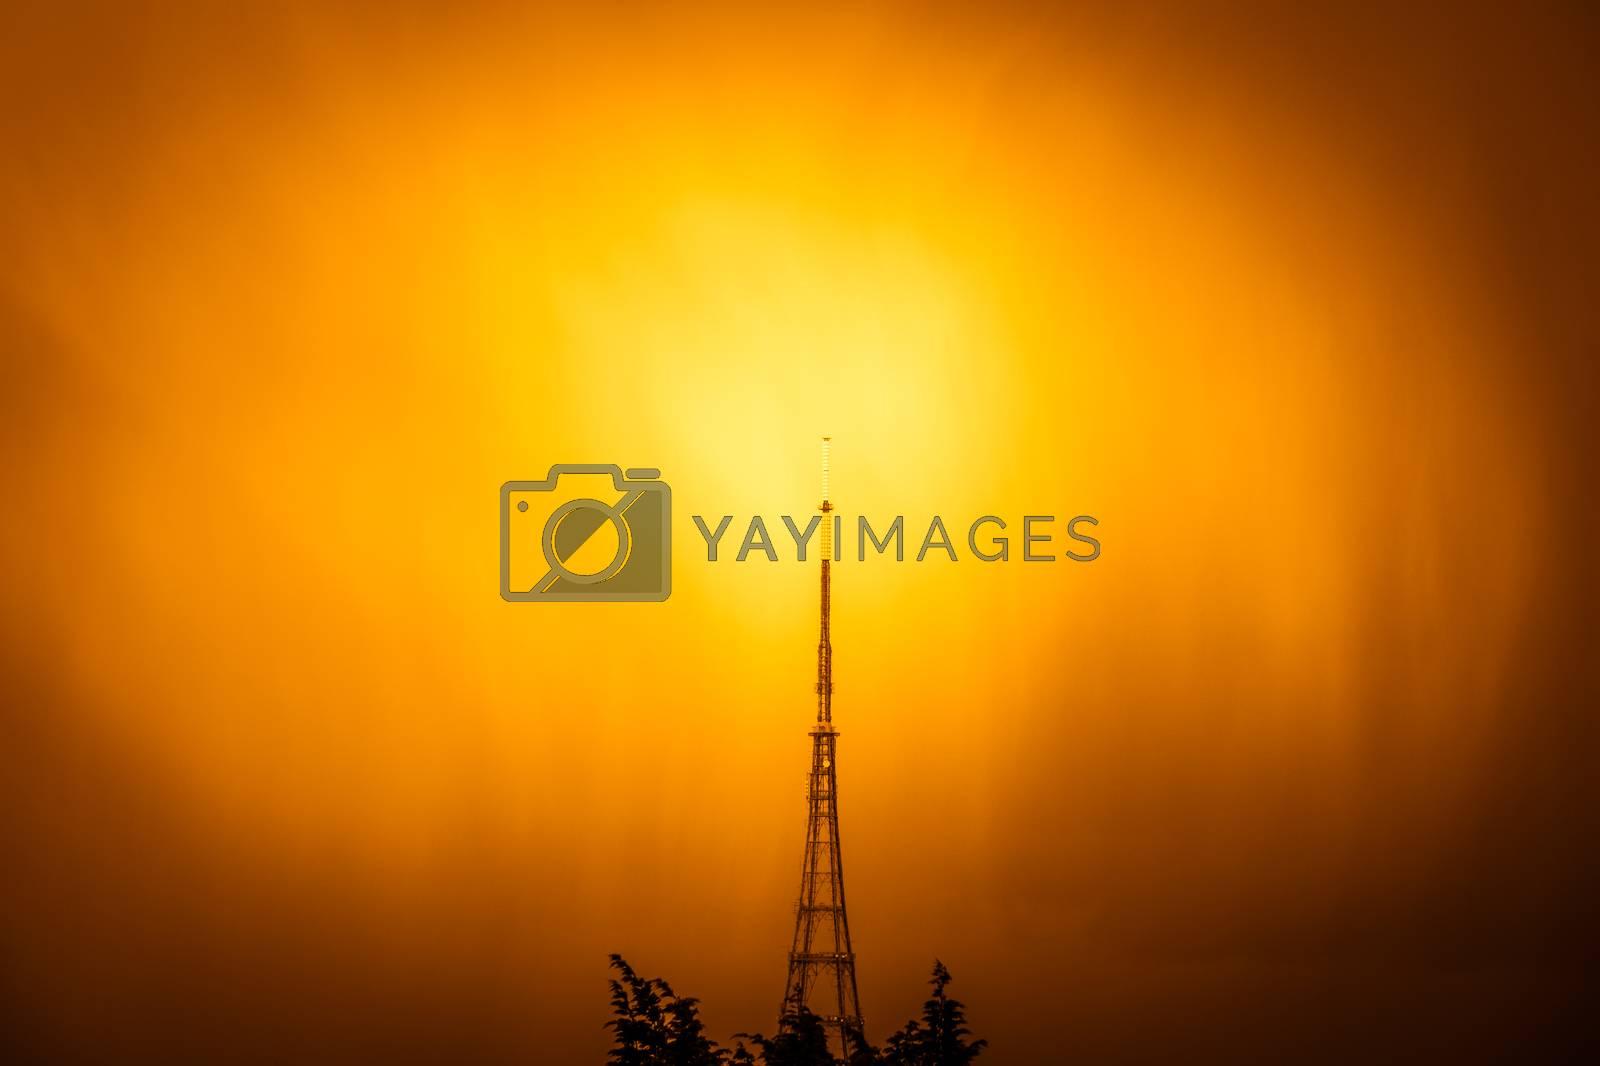 The high Crystal Palace transmitting station at sunrise, Bromley, London, UK